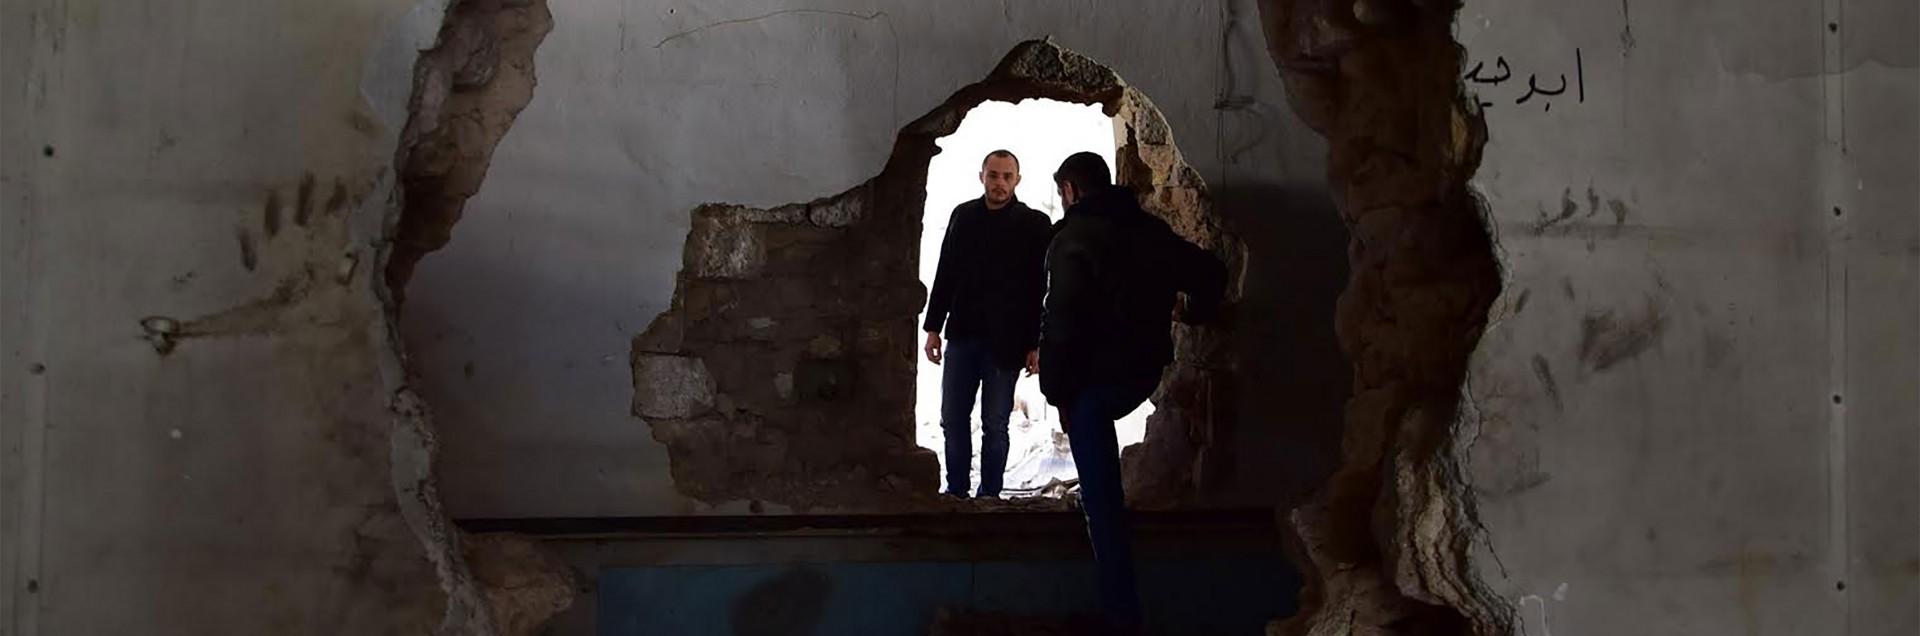 Aleppo, nei tunnel dei jihadisti